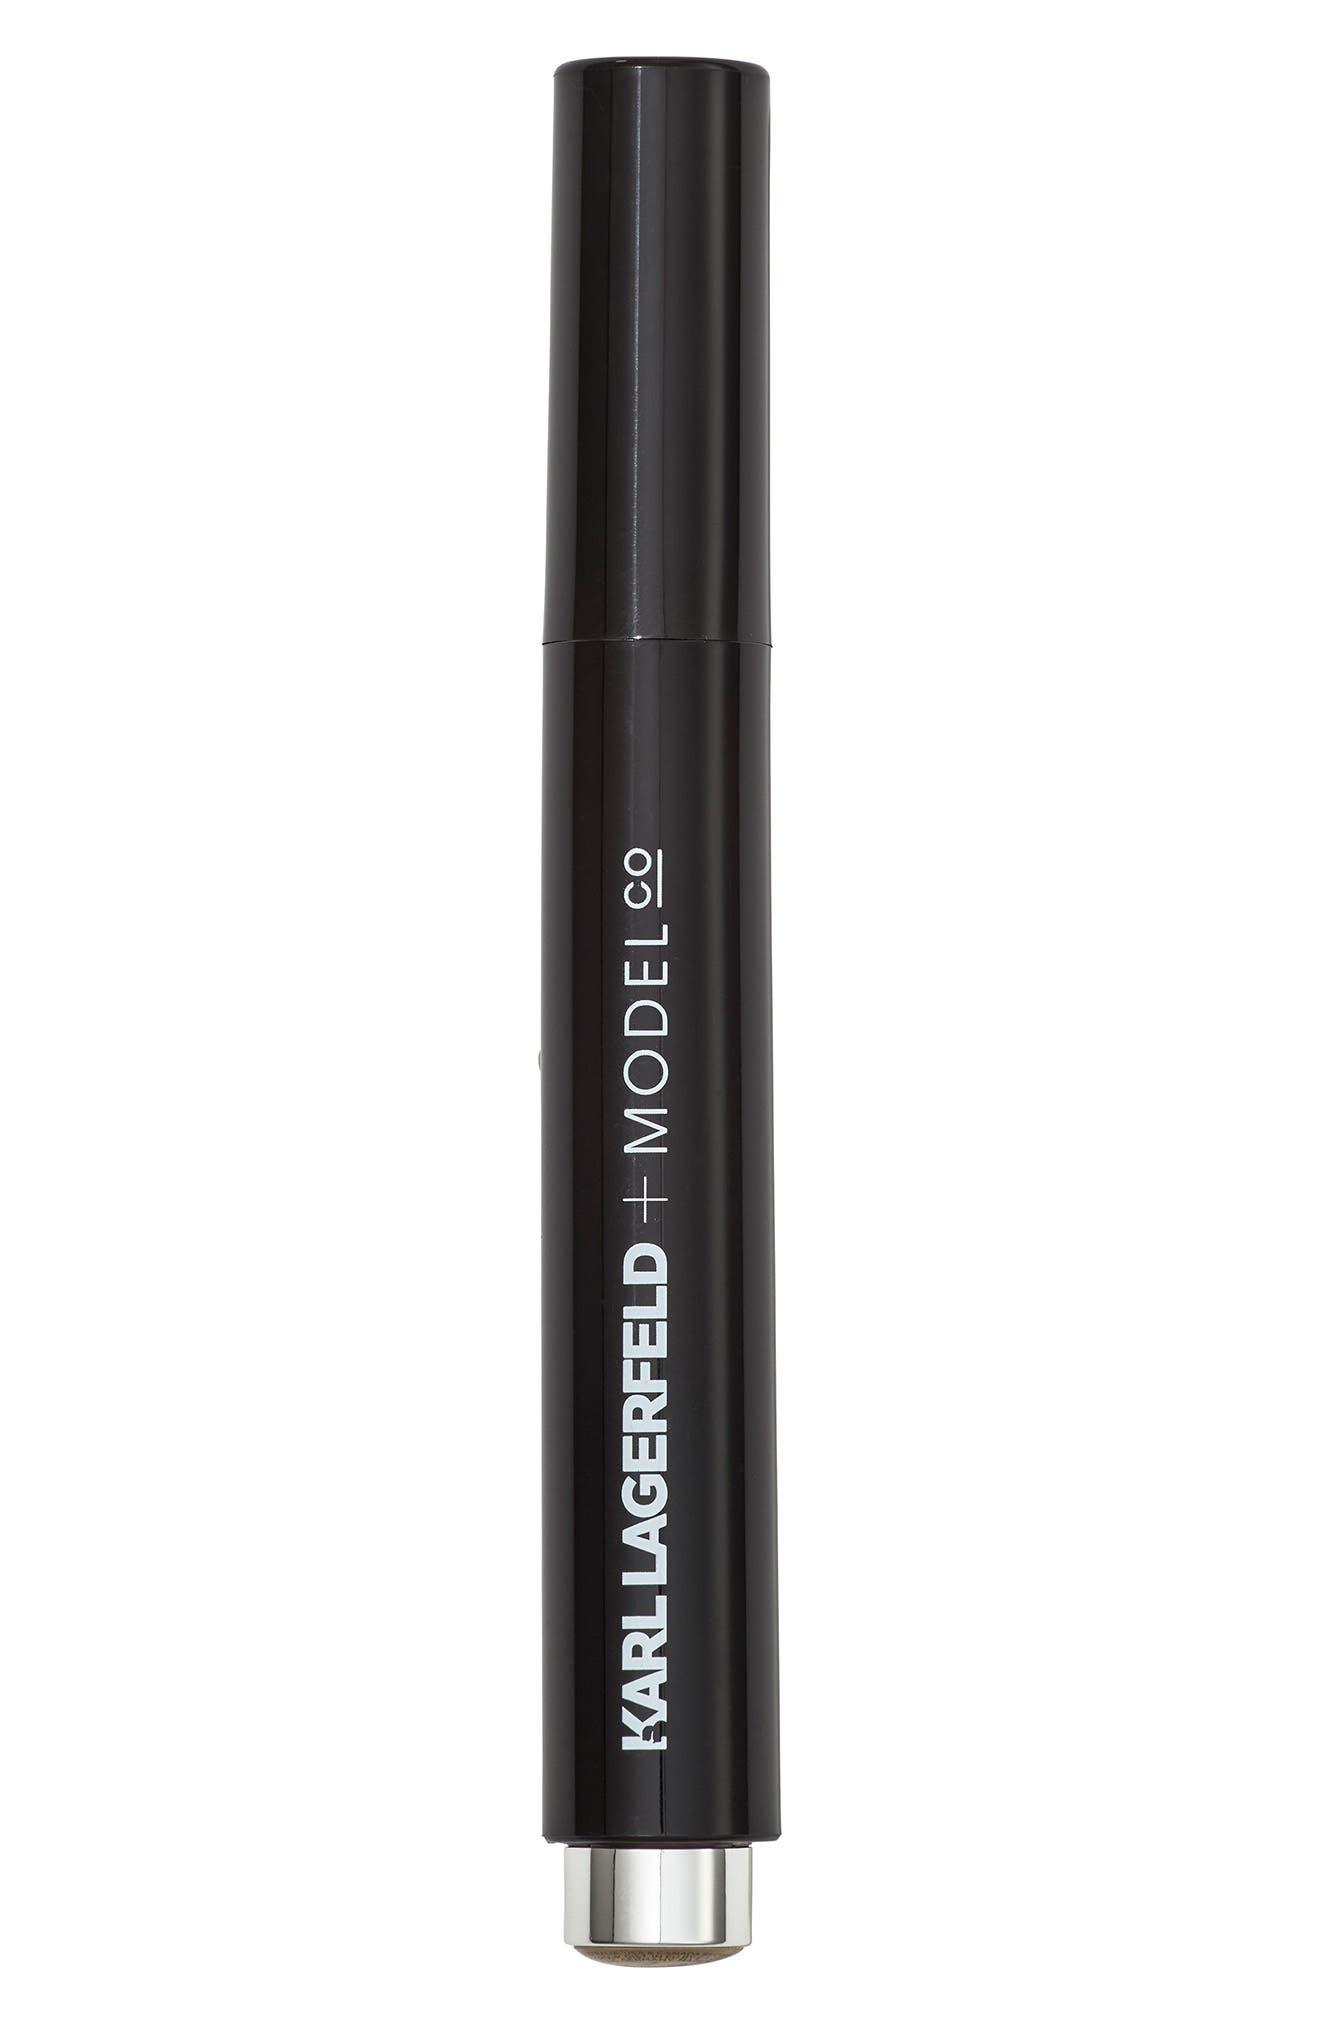 KARL LAGERFELD + MODELCO Kiss Me Karl Liquid Luminizer Strobing Pen,                             Alternate thumbnail 2, color,                             BRONZE